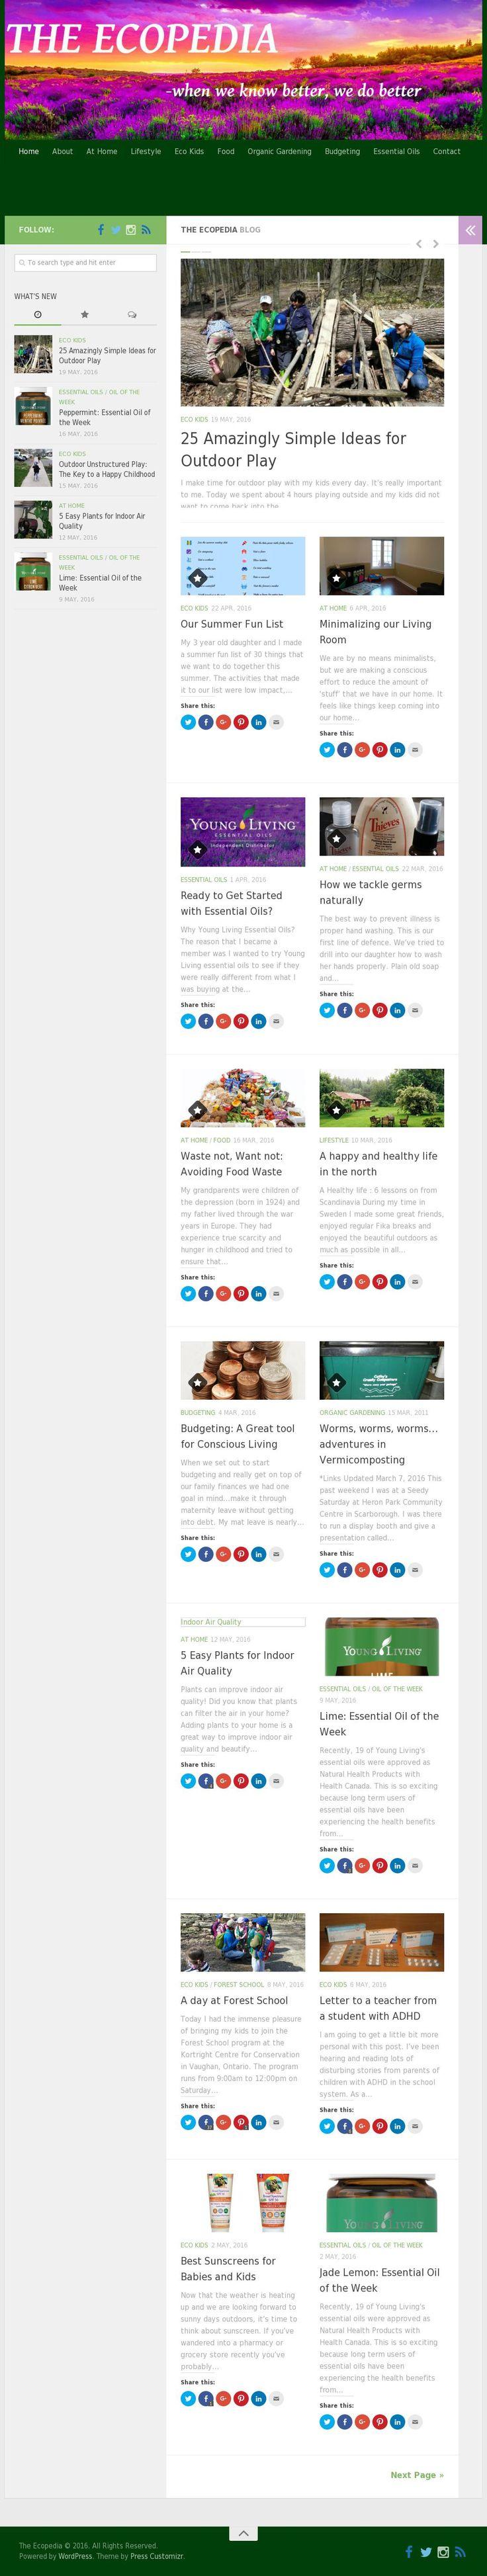 The website 'www.theecopedia.com' courtesy of @Pinstamatic (http://pinstamatic.com)